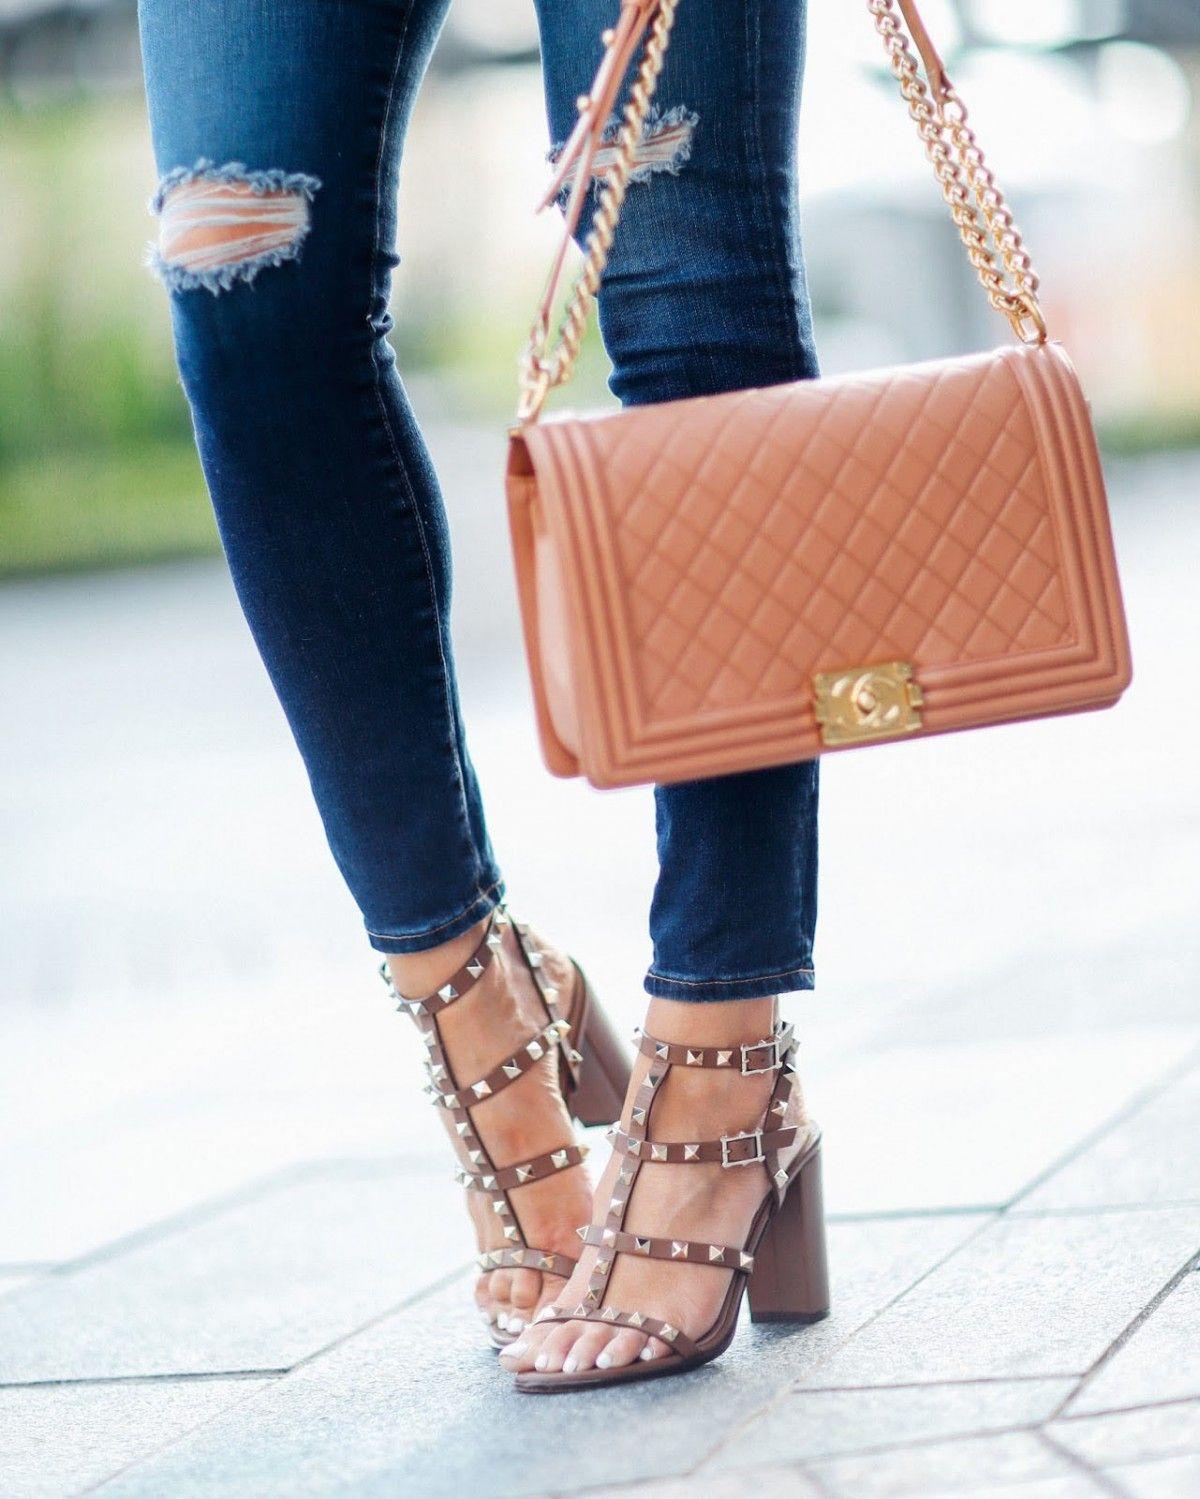 VALENTINO The Rockstud embellished leather sandals - Shoes Post